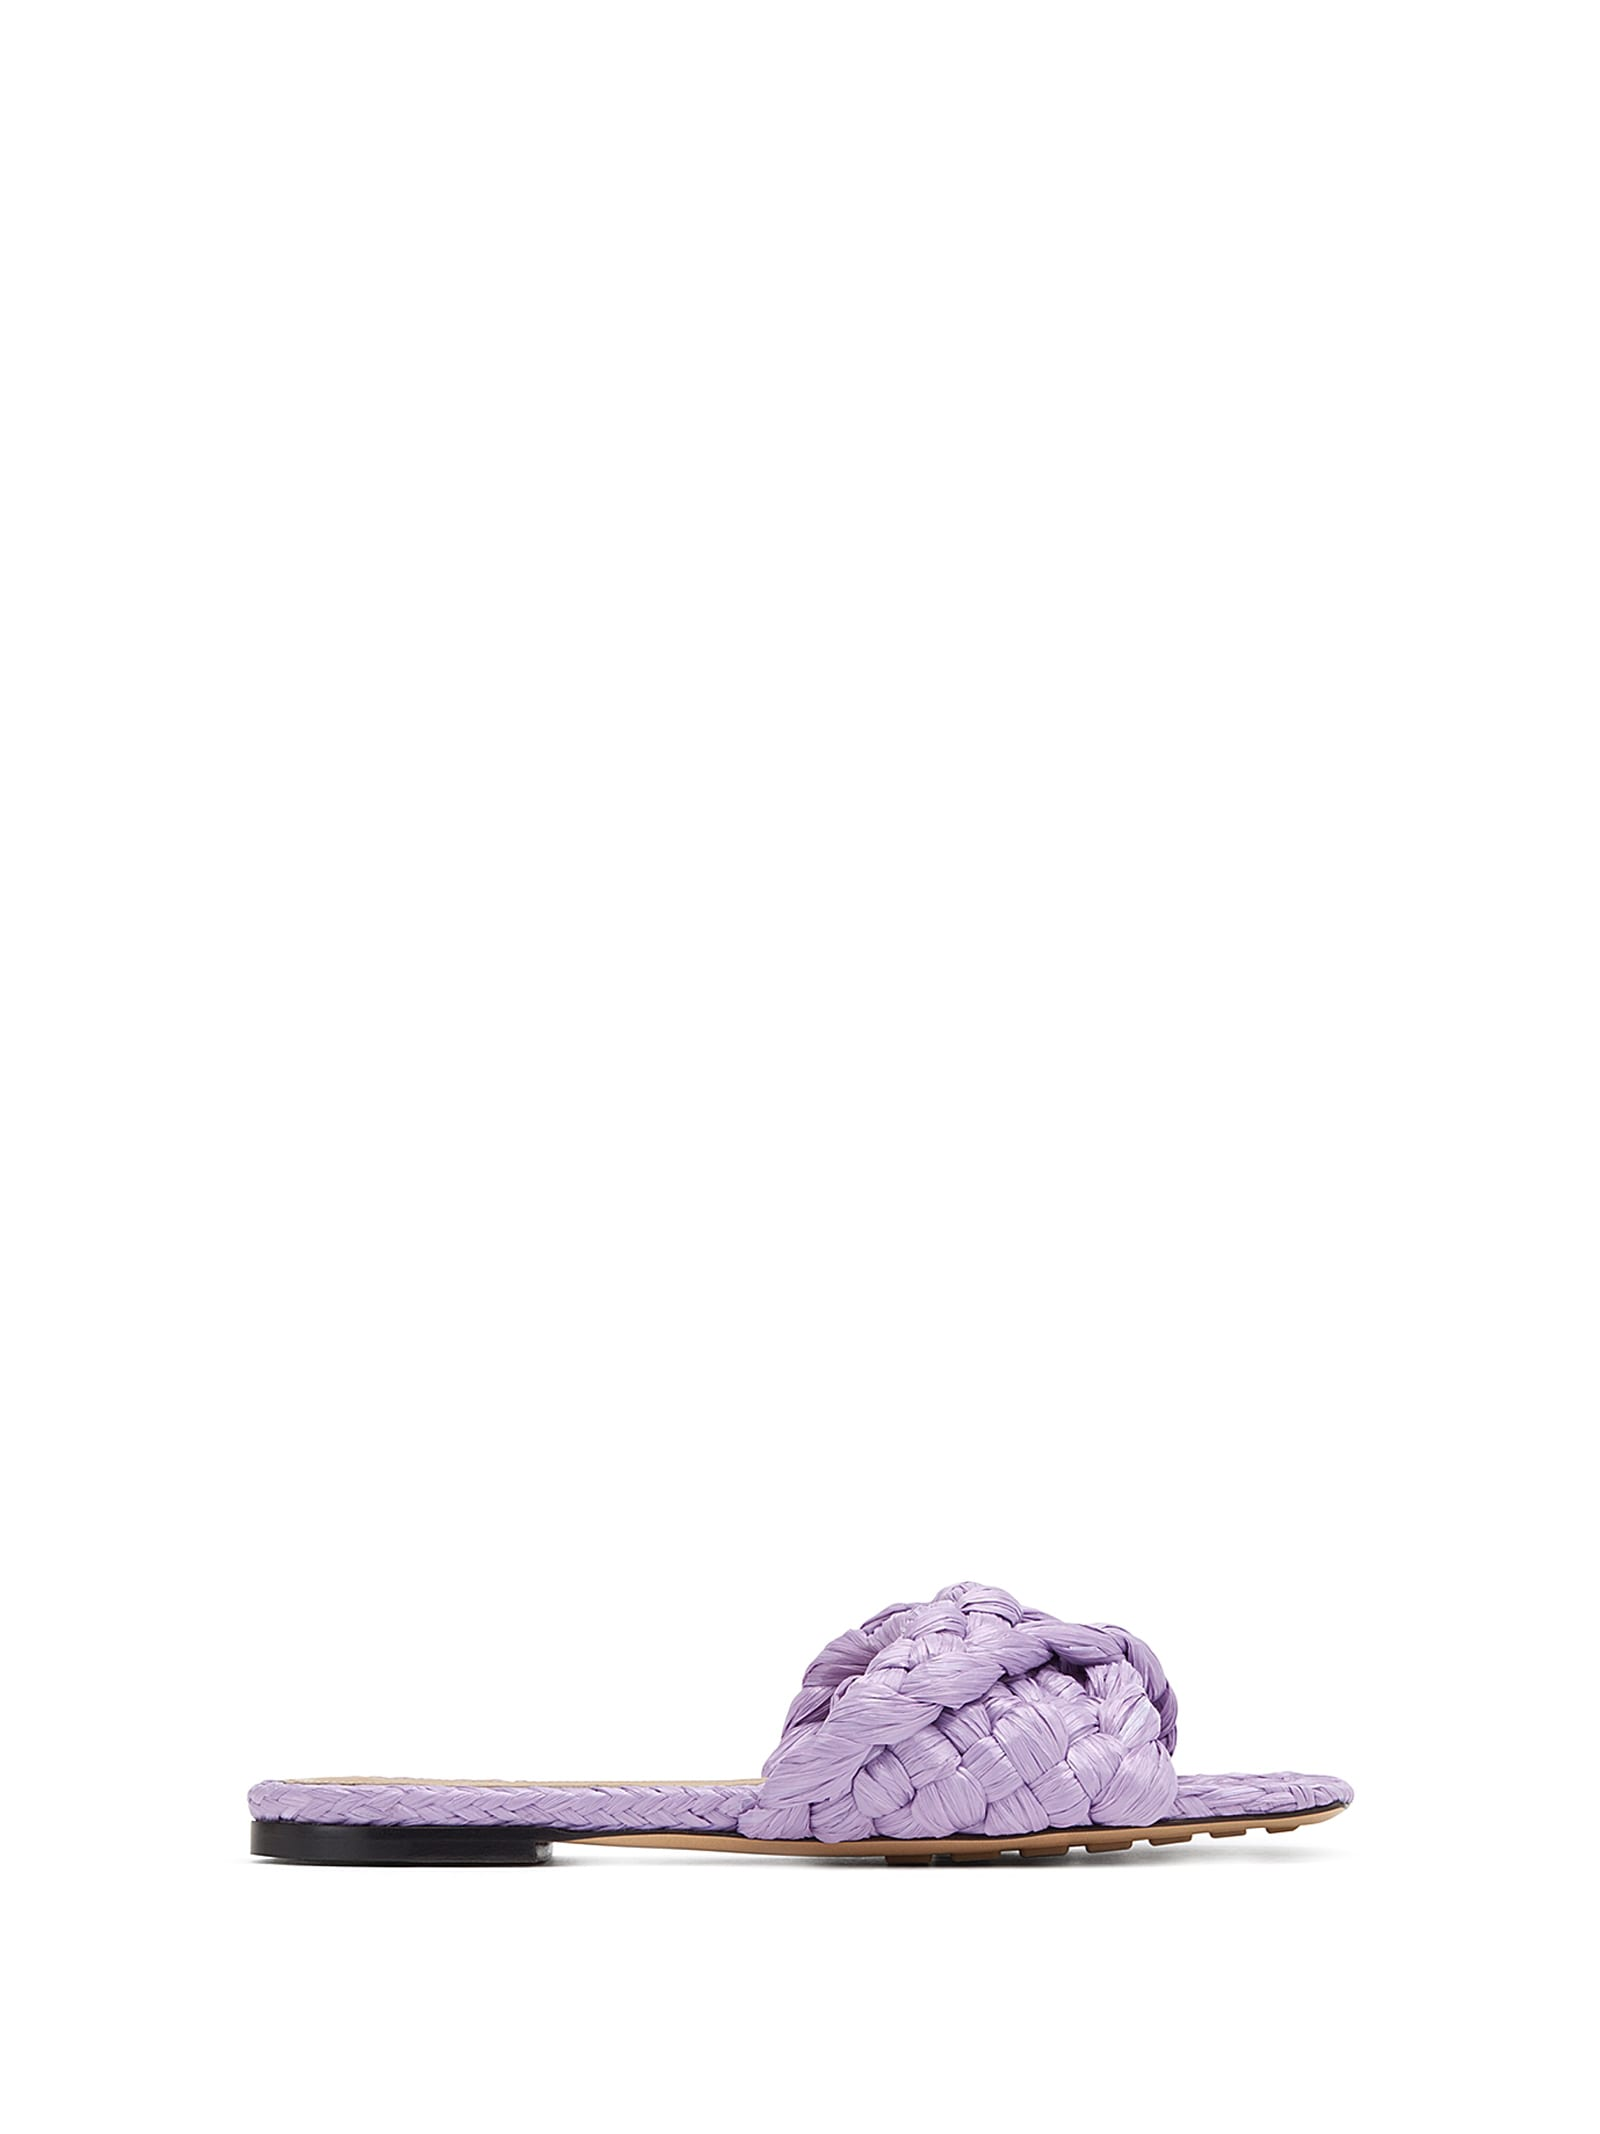 Buy Bottega Veneta Bottega Veneta Stretch Flat Sandals online, shop Bottega Veneta shoes with free shipping